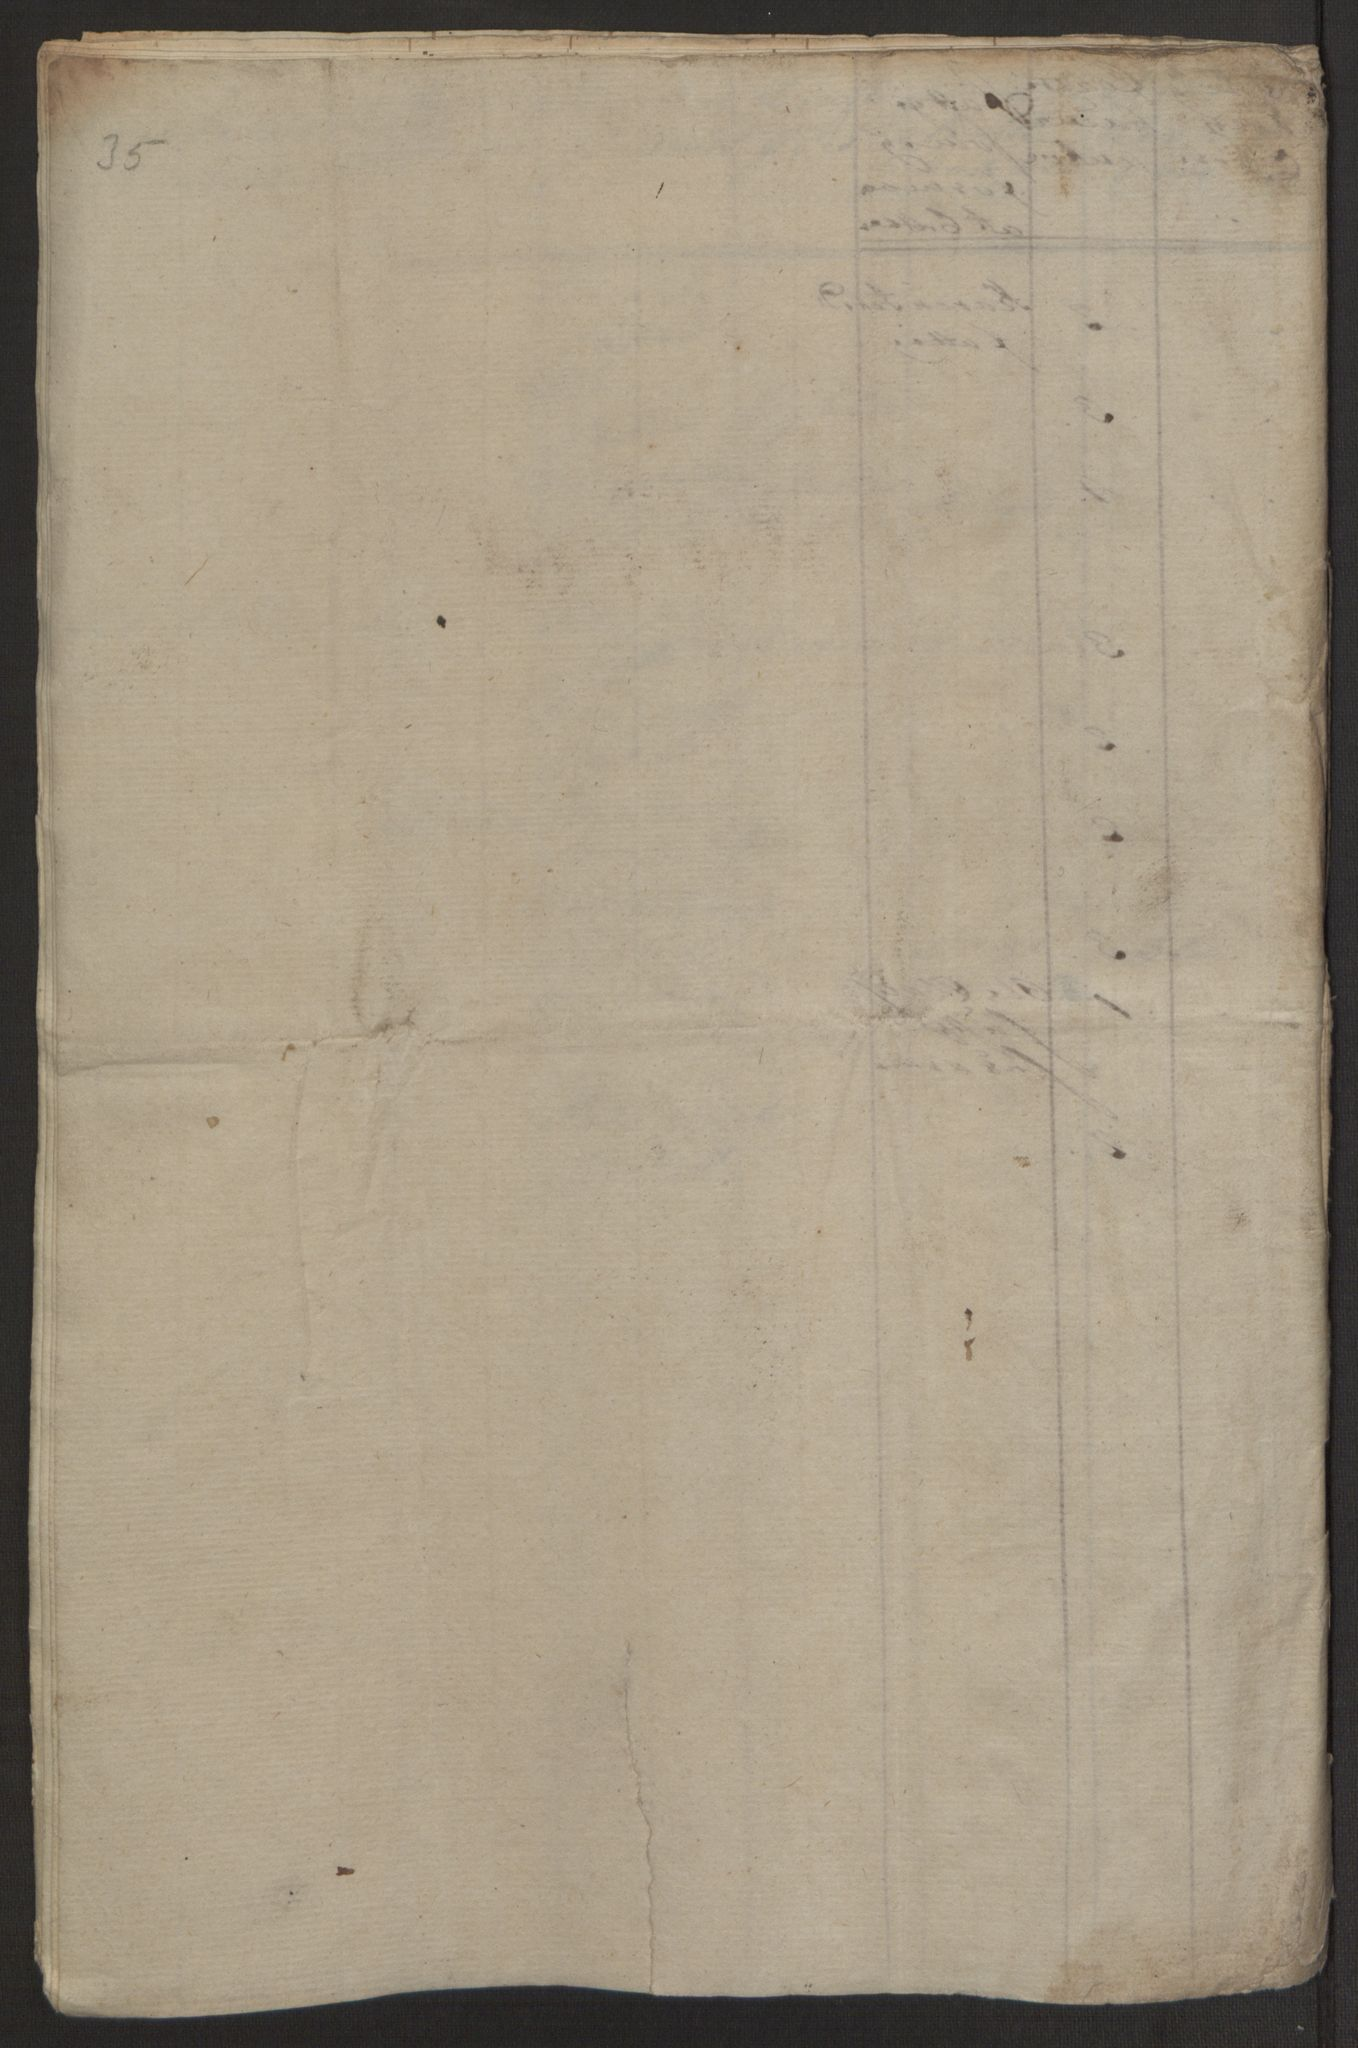 RA, Rentekammeret inntil 1814, Realistisk ordnet avdeling, Ol/L0022a: [Gg 10]: Ekstraskatten, 23.09.1762. Nordlands amt, 1763-1769, s. 318